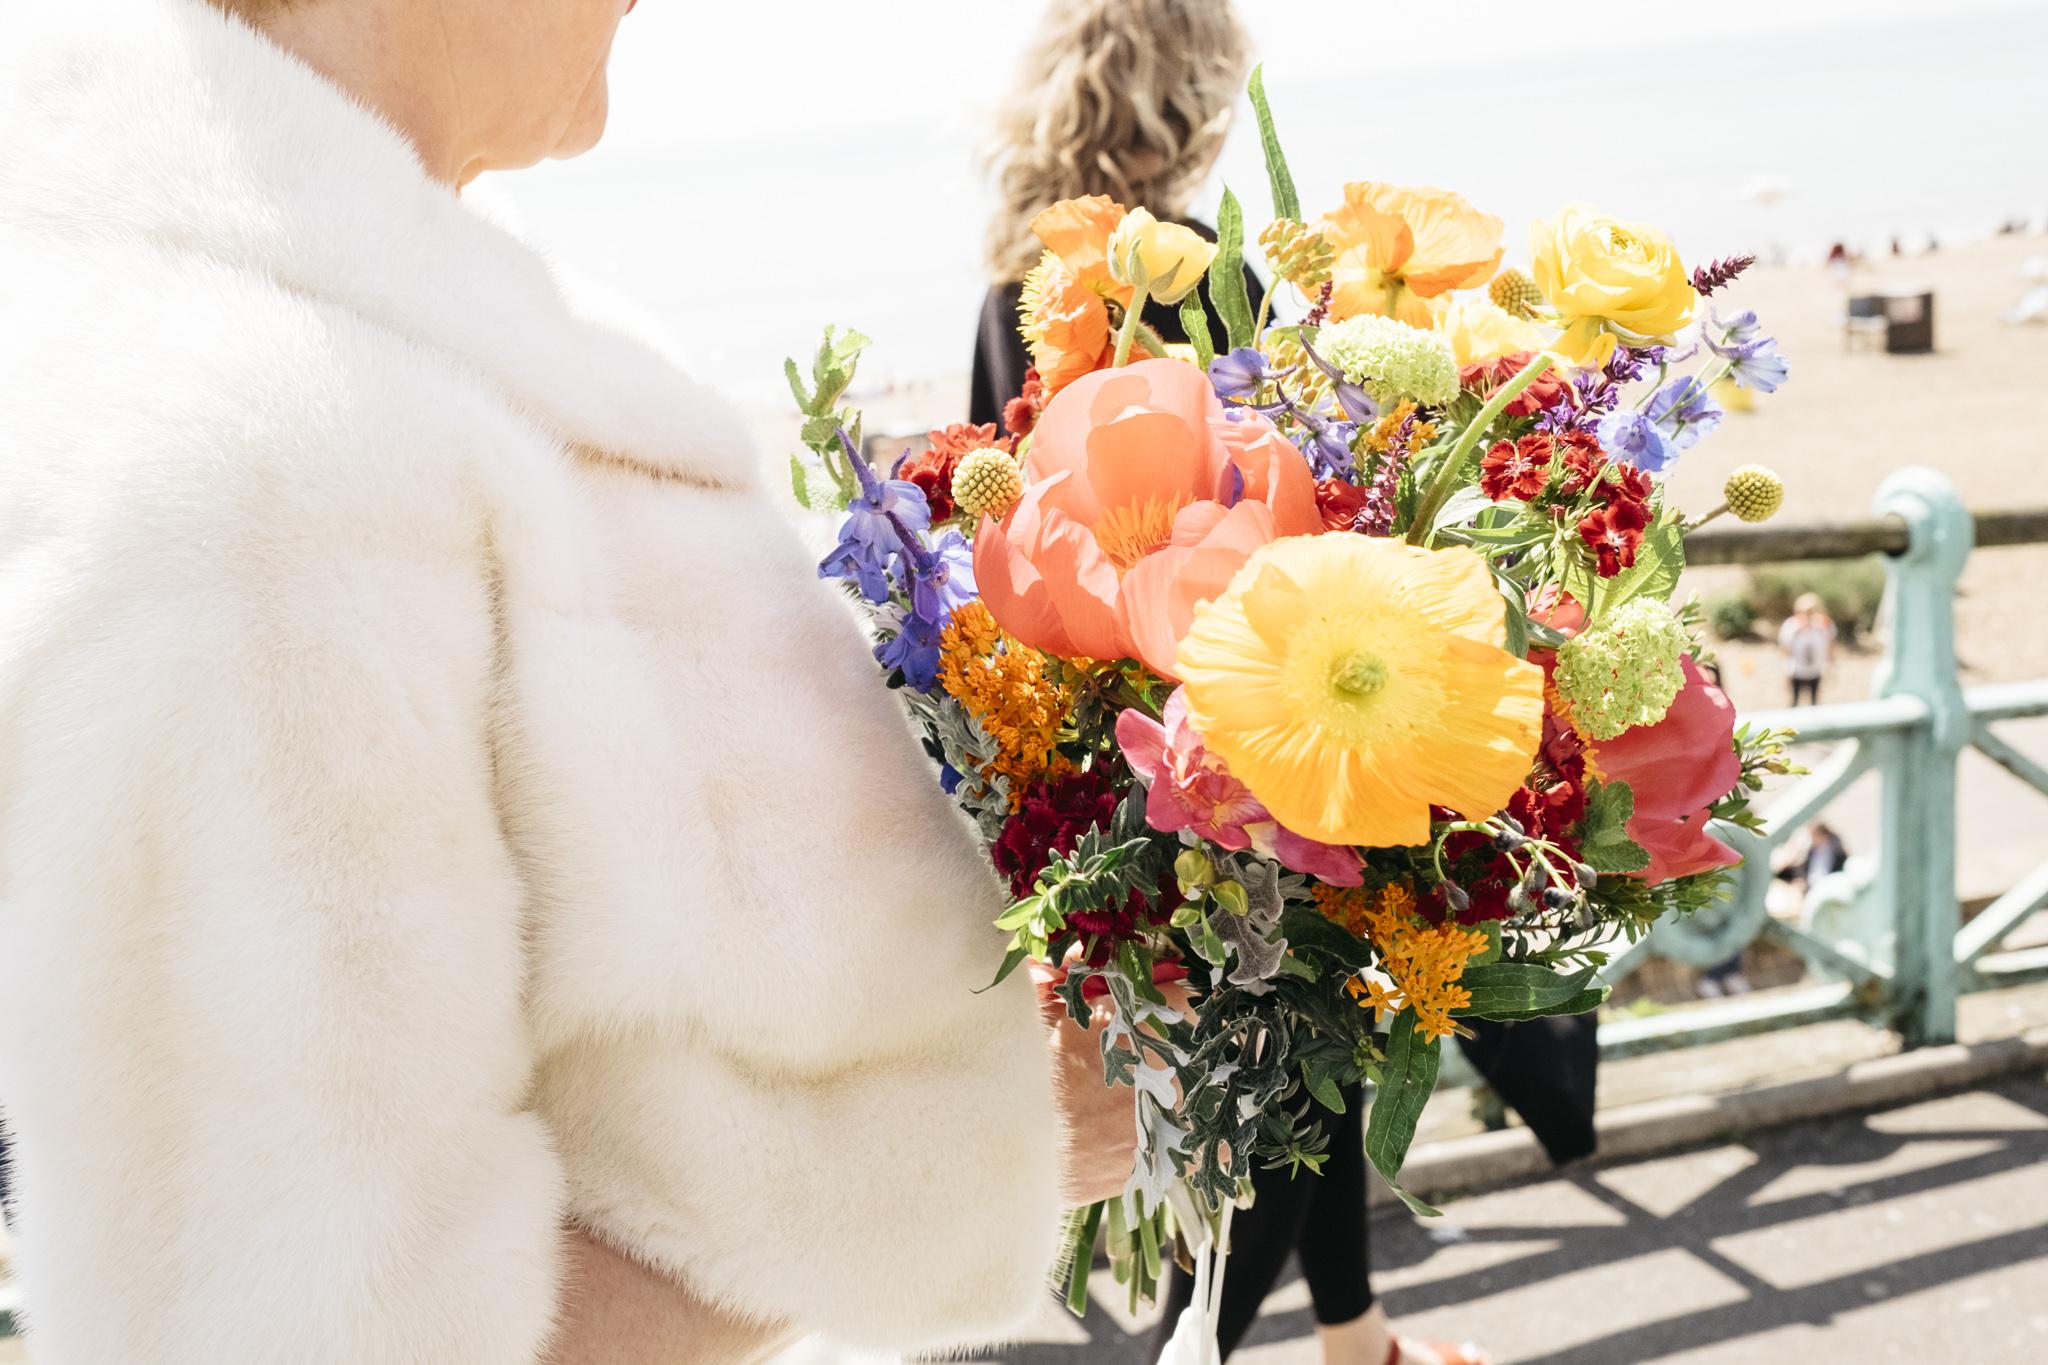 short_coverage_wedding_photographer_brighton_021.jpg